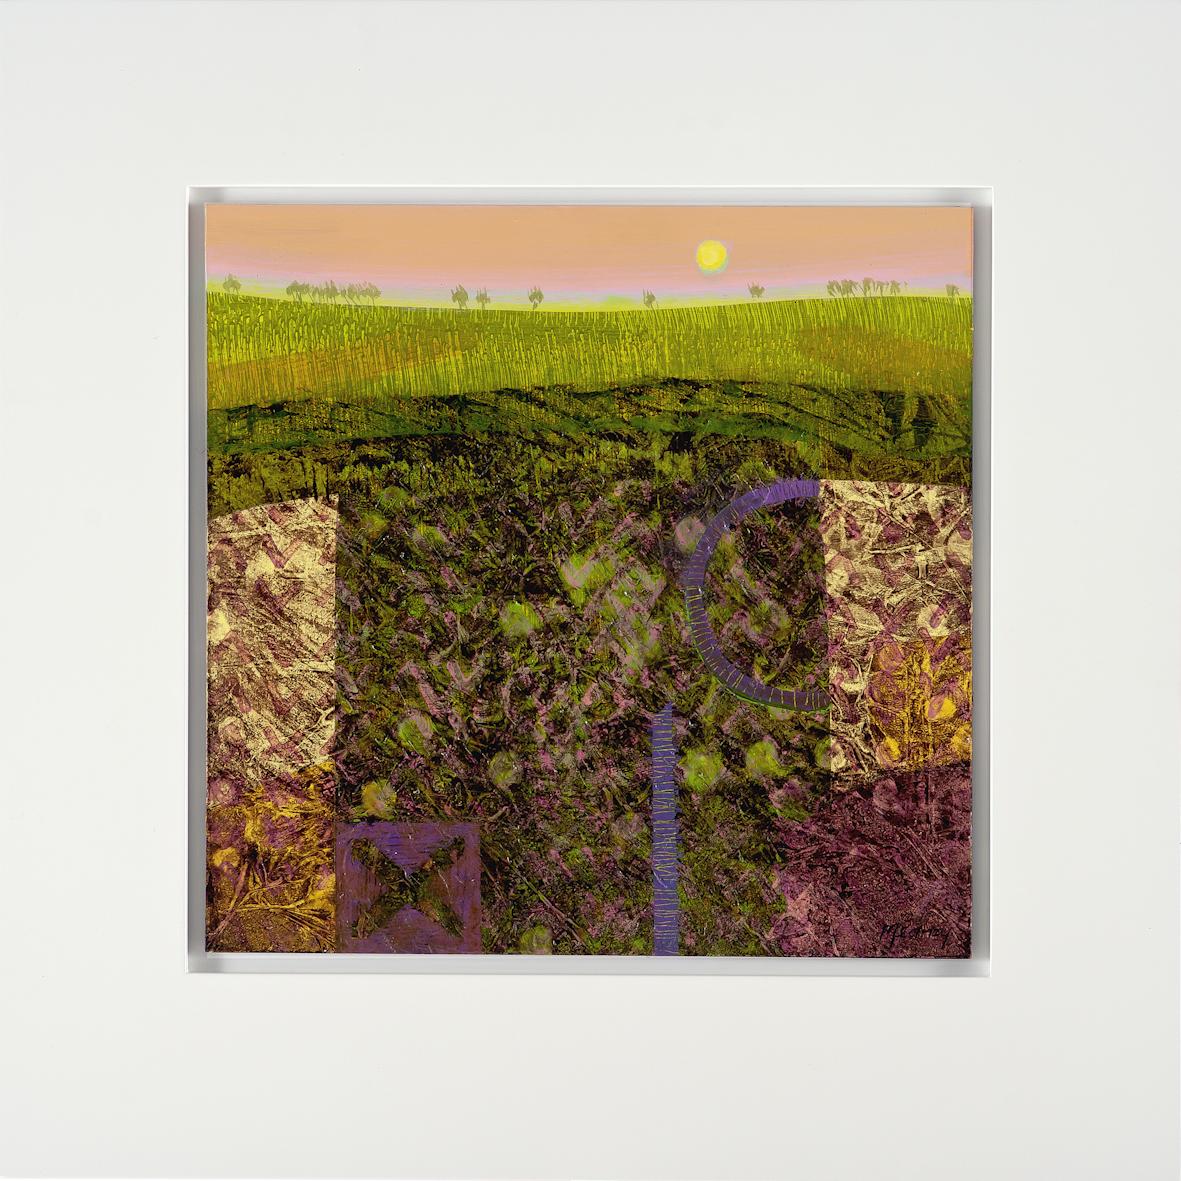 Lesley-Meaney-Memoir-of-a-Glowing-Twilight-acrylic-on-board-65cmW-x-65cmH.jpg